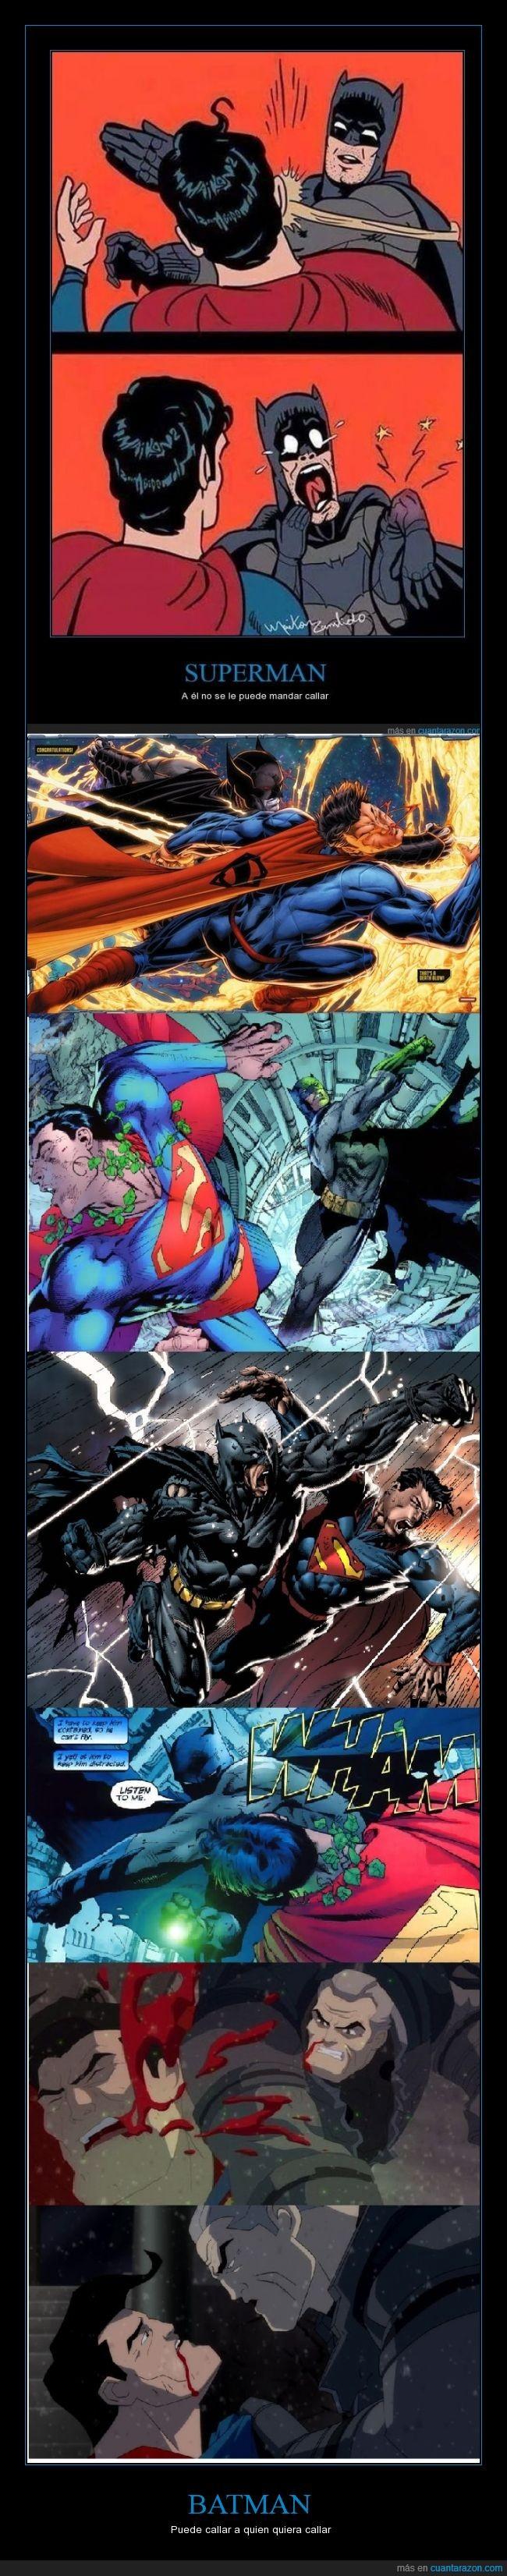 batman,callar,golpe,kriptonita,pegar,puñetazo,silencio,superman